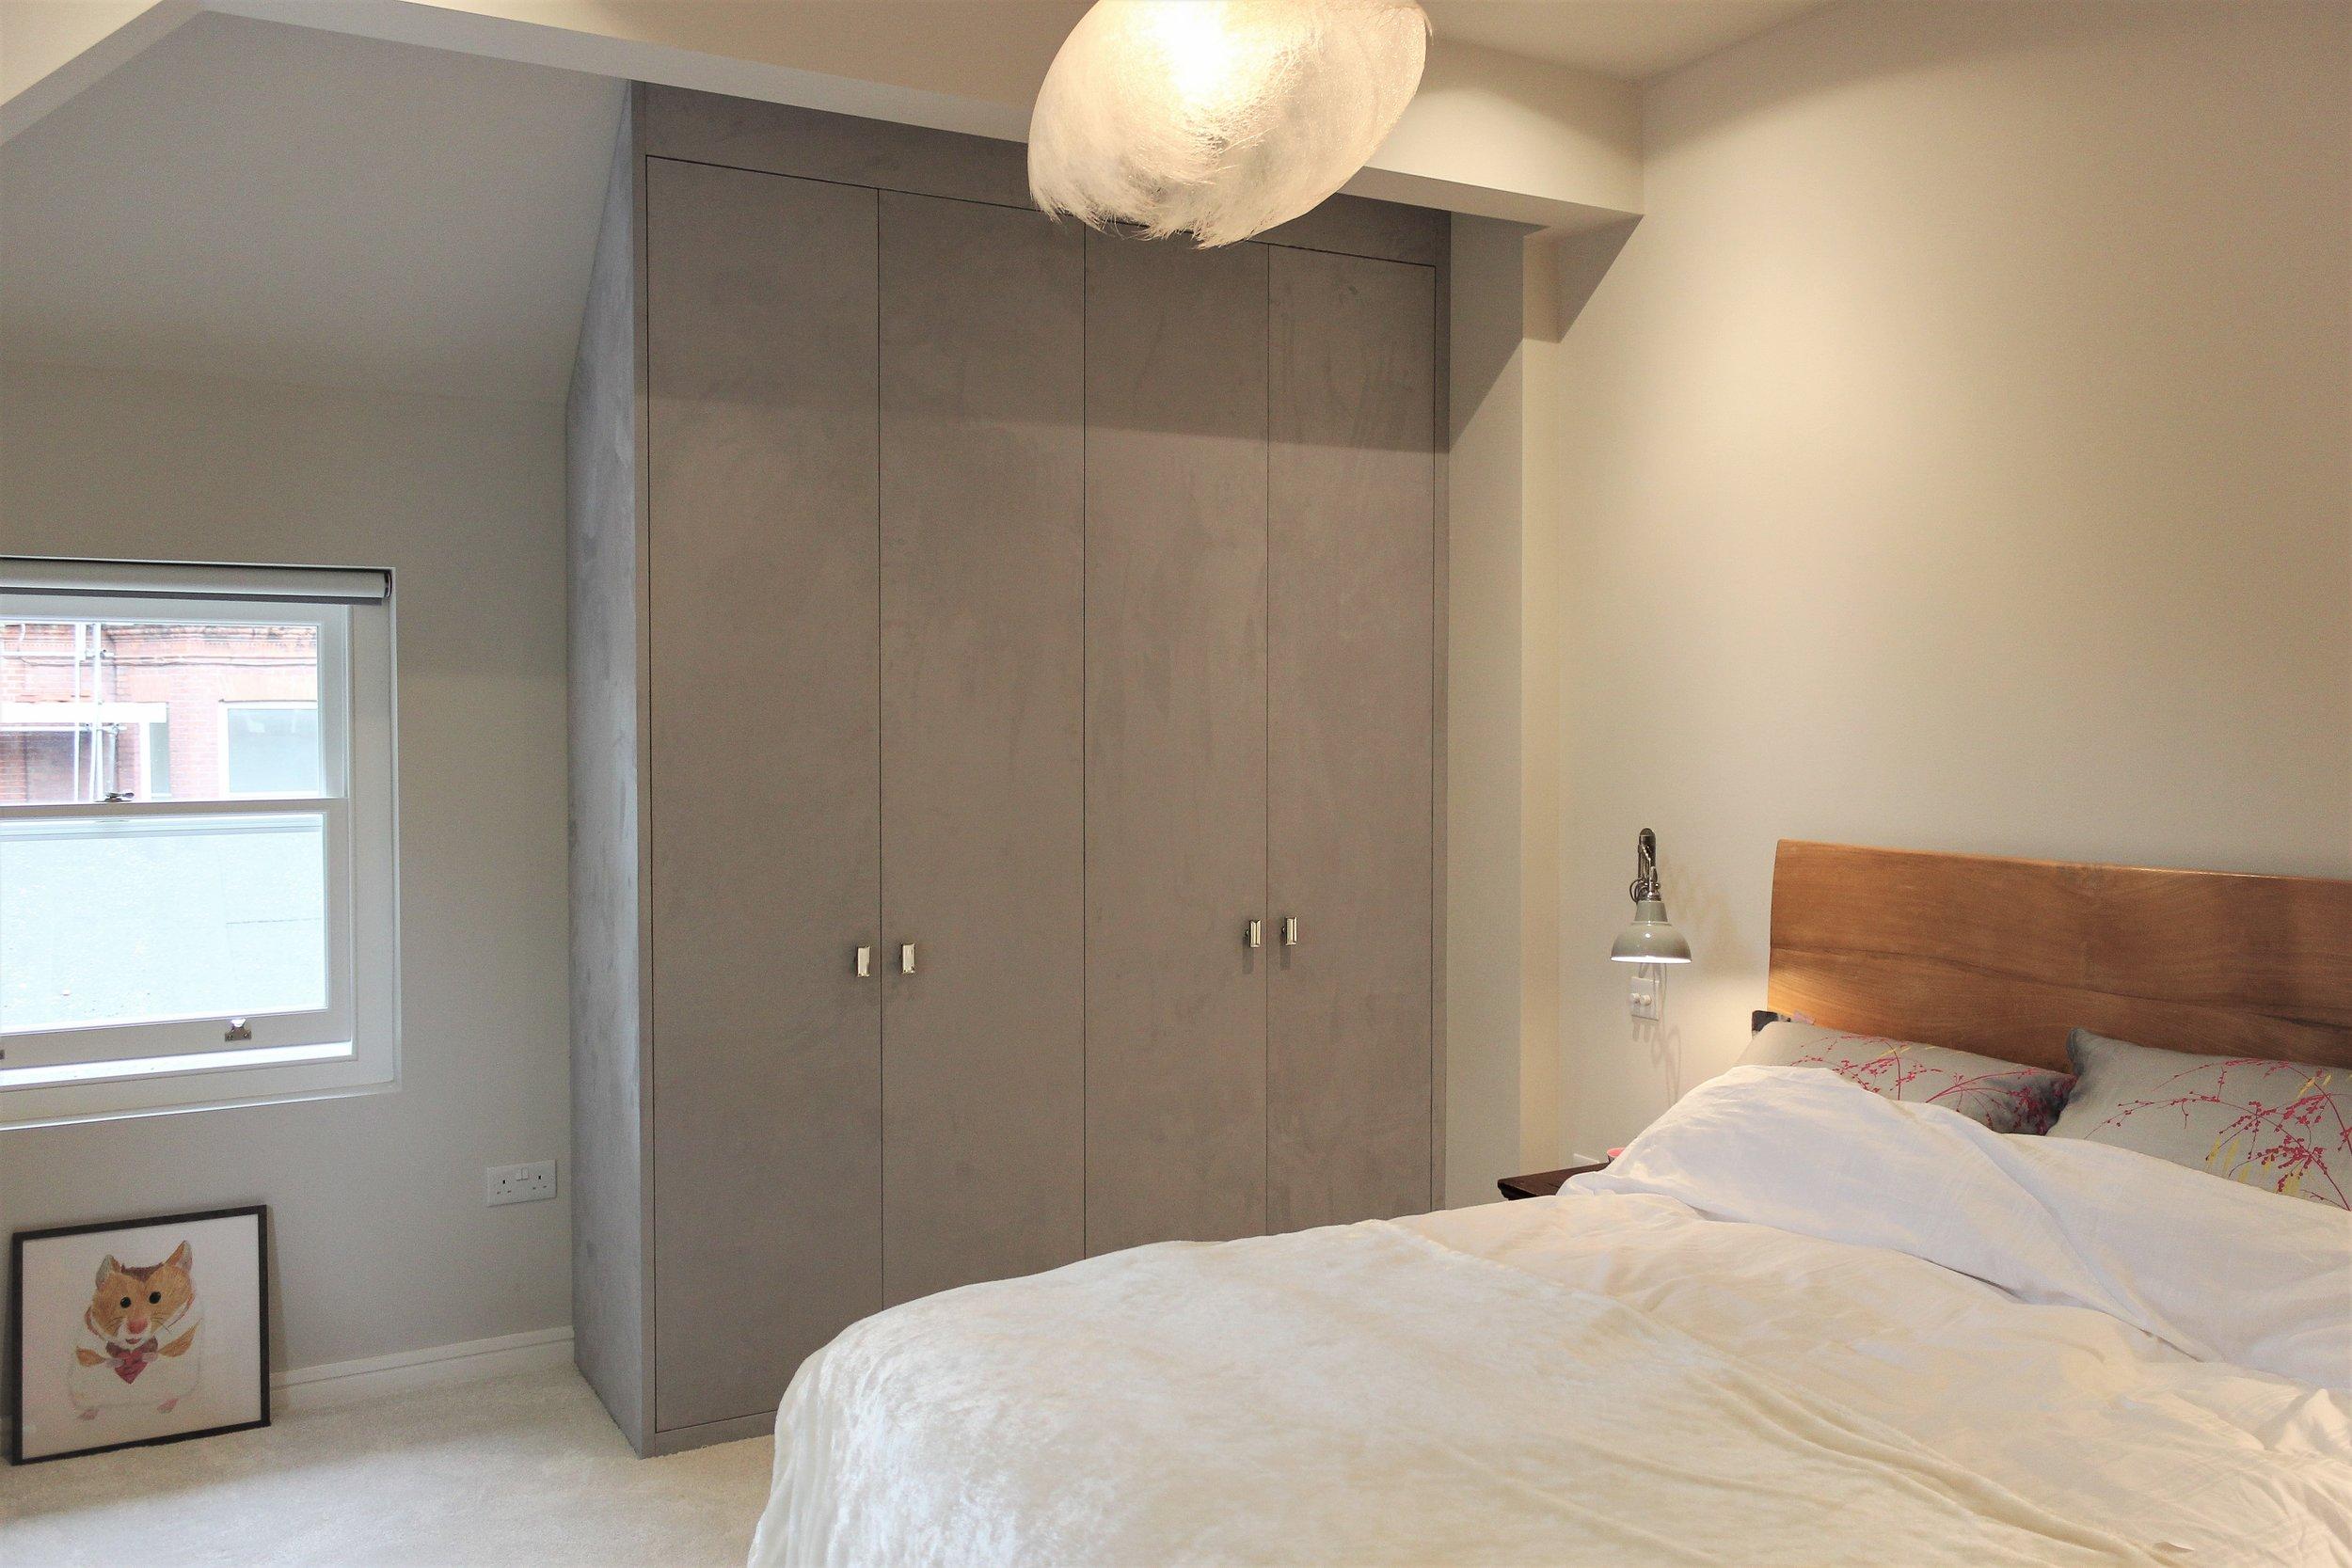 Upholstery wardrobe doors.jpg